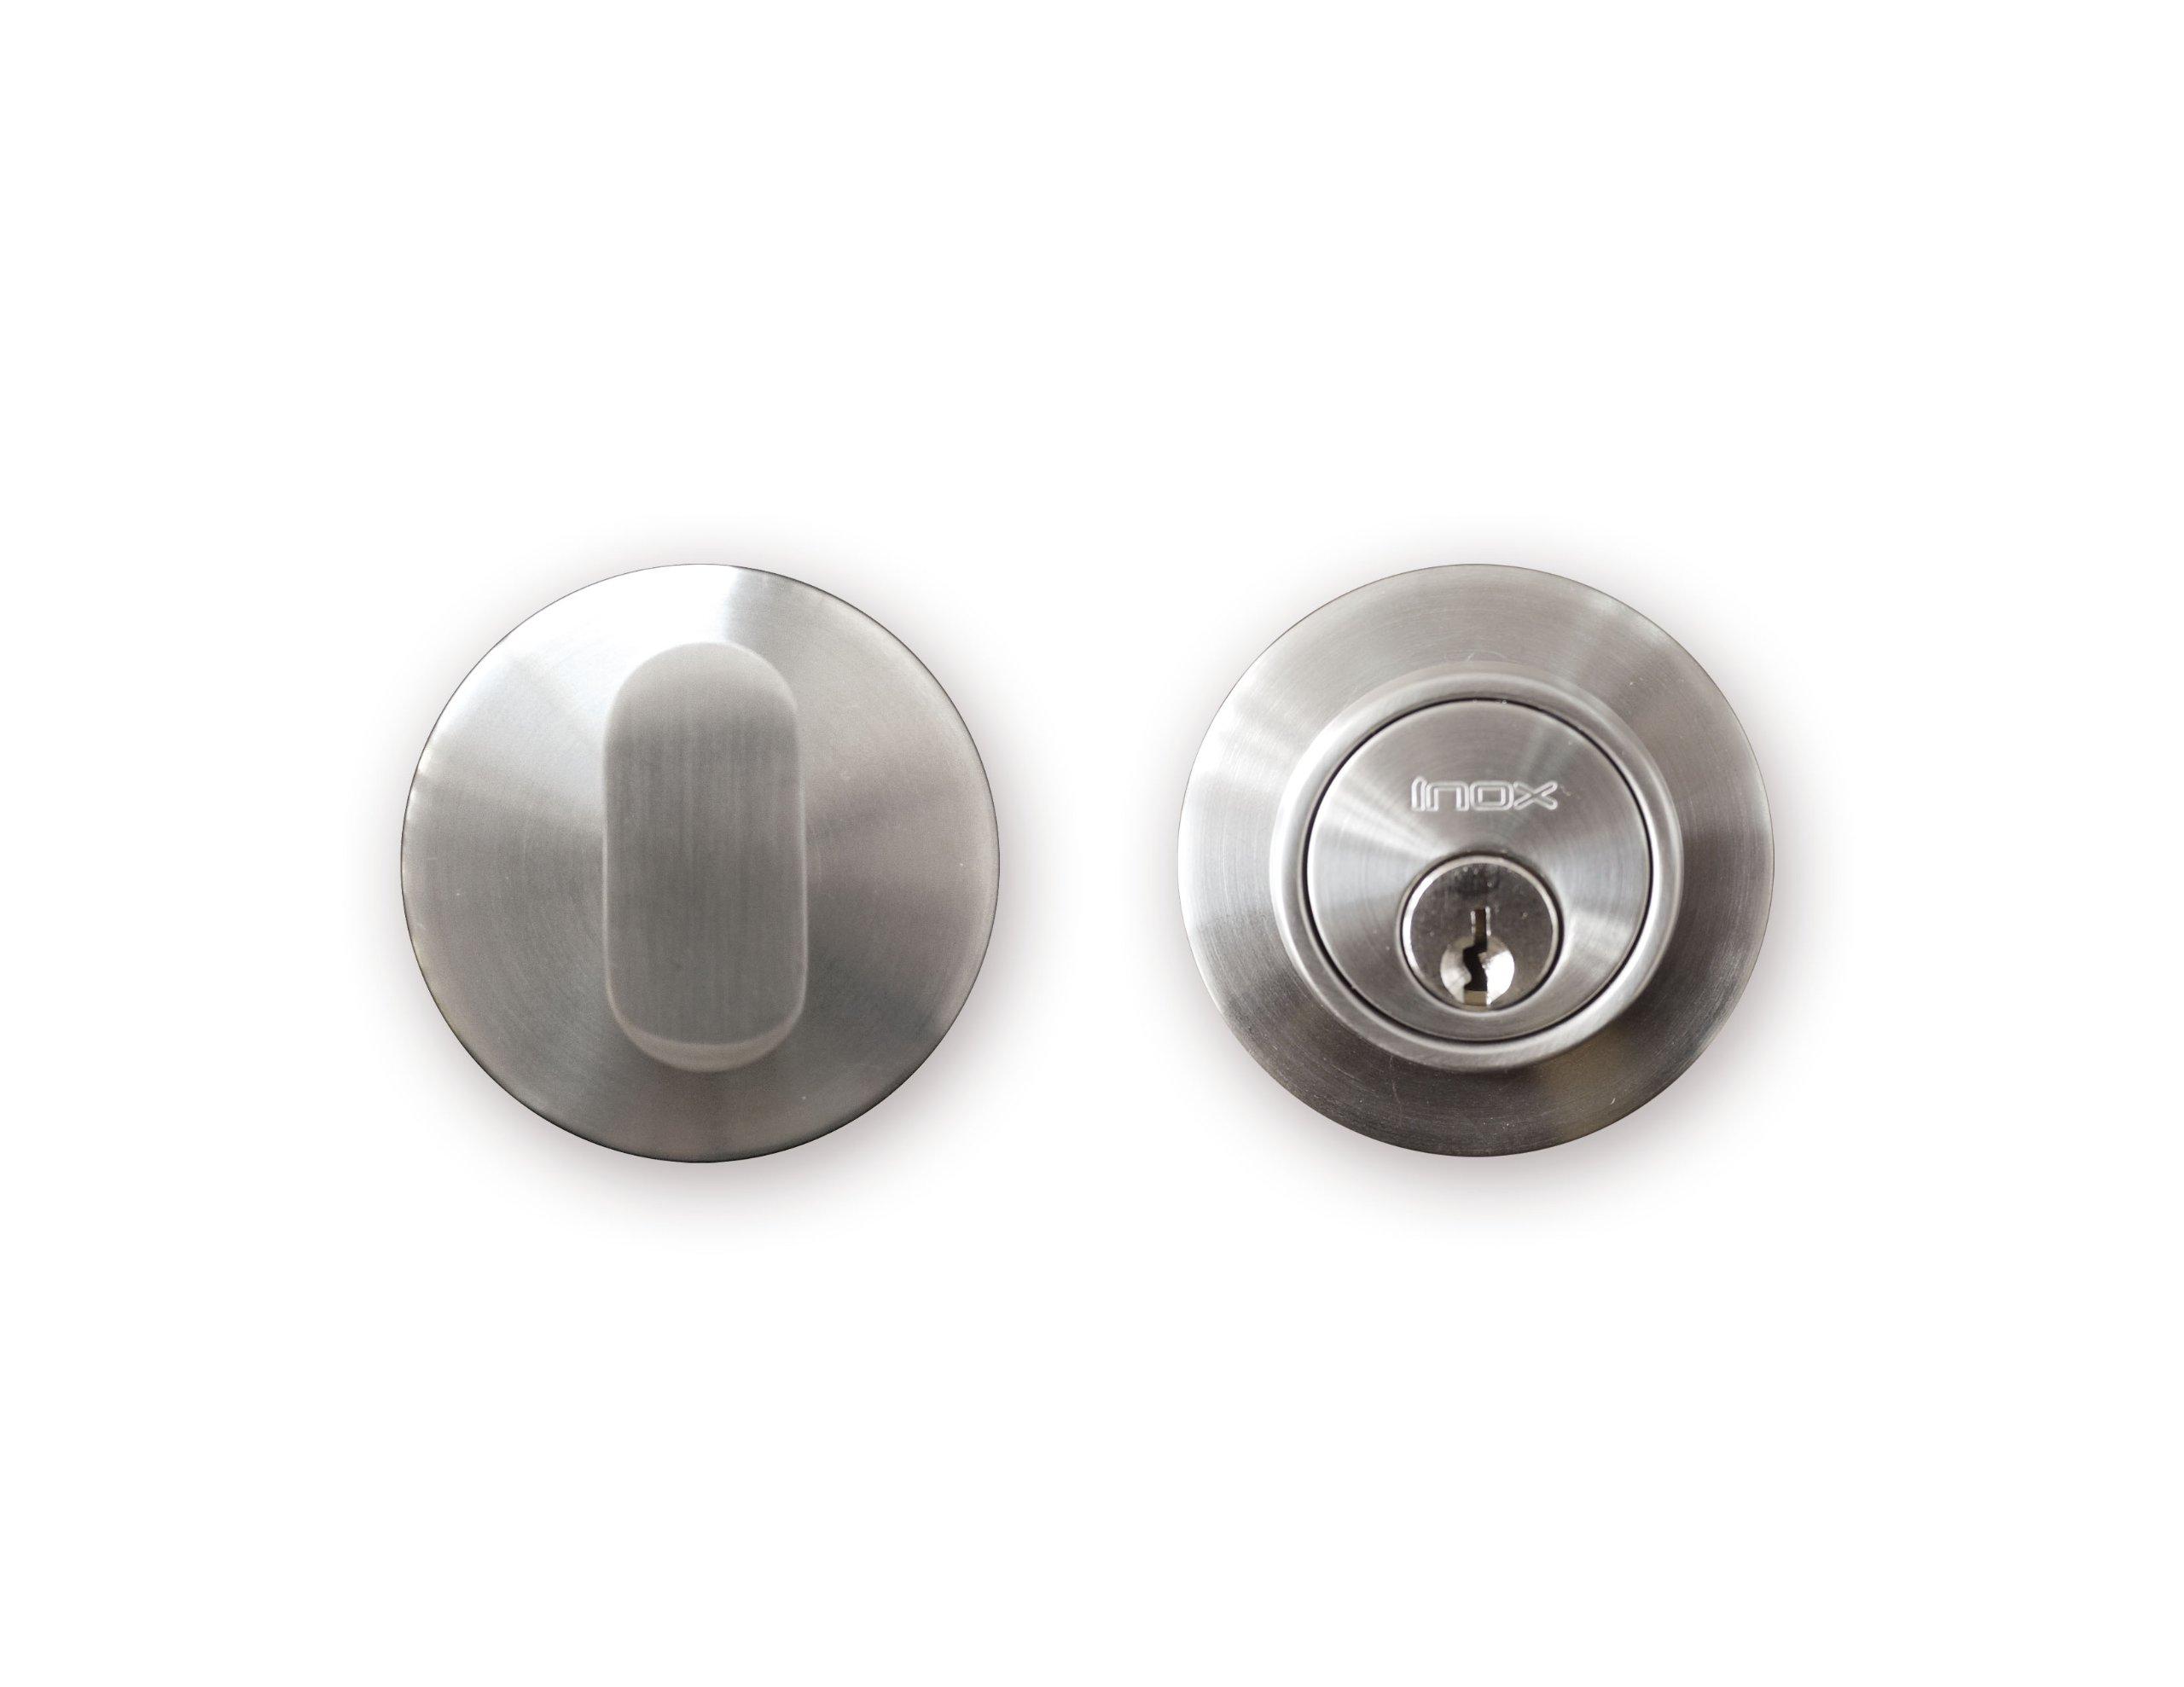 INOX CD110B6-32D Single Cylinder Deadbolt, 2-1/2'', Satin Stainless Steel